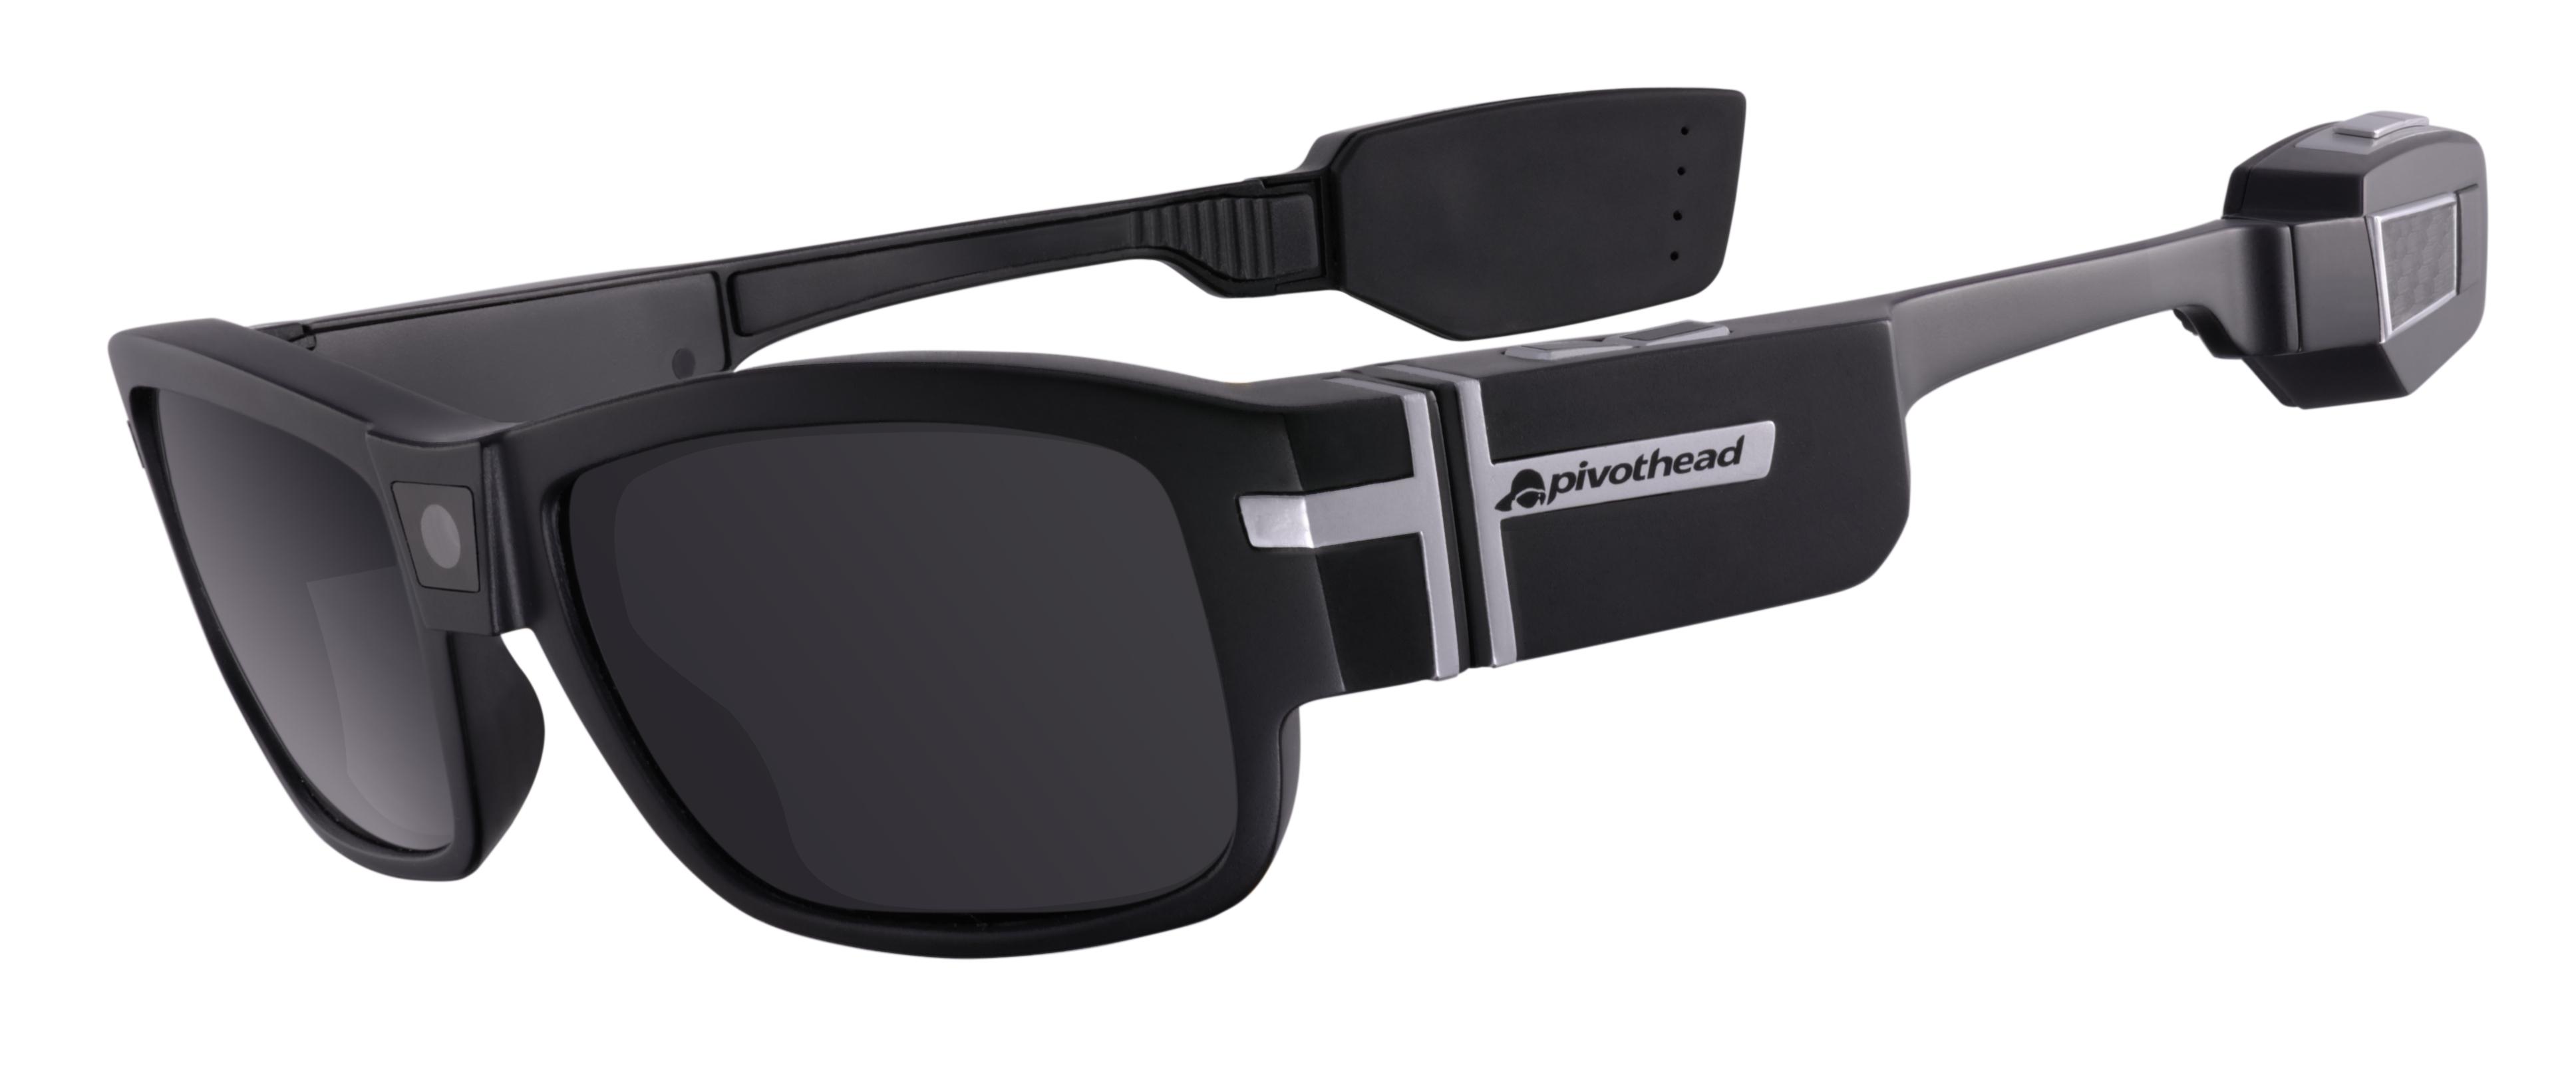 ba27f7c3ba48 Eyeglasses Cam  Pivot for the Video Wearing the Pivothead SMART ...